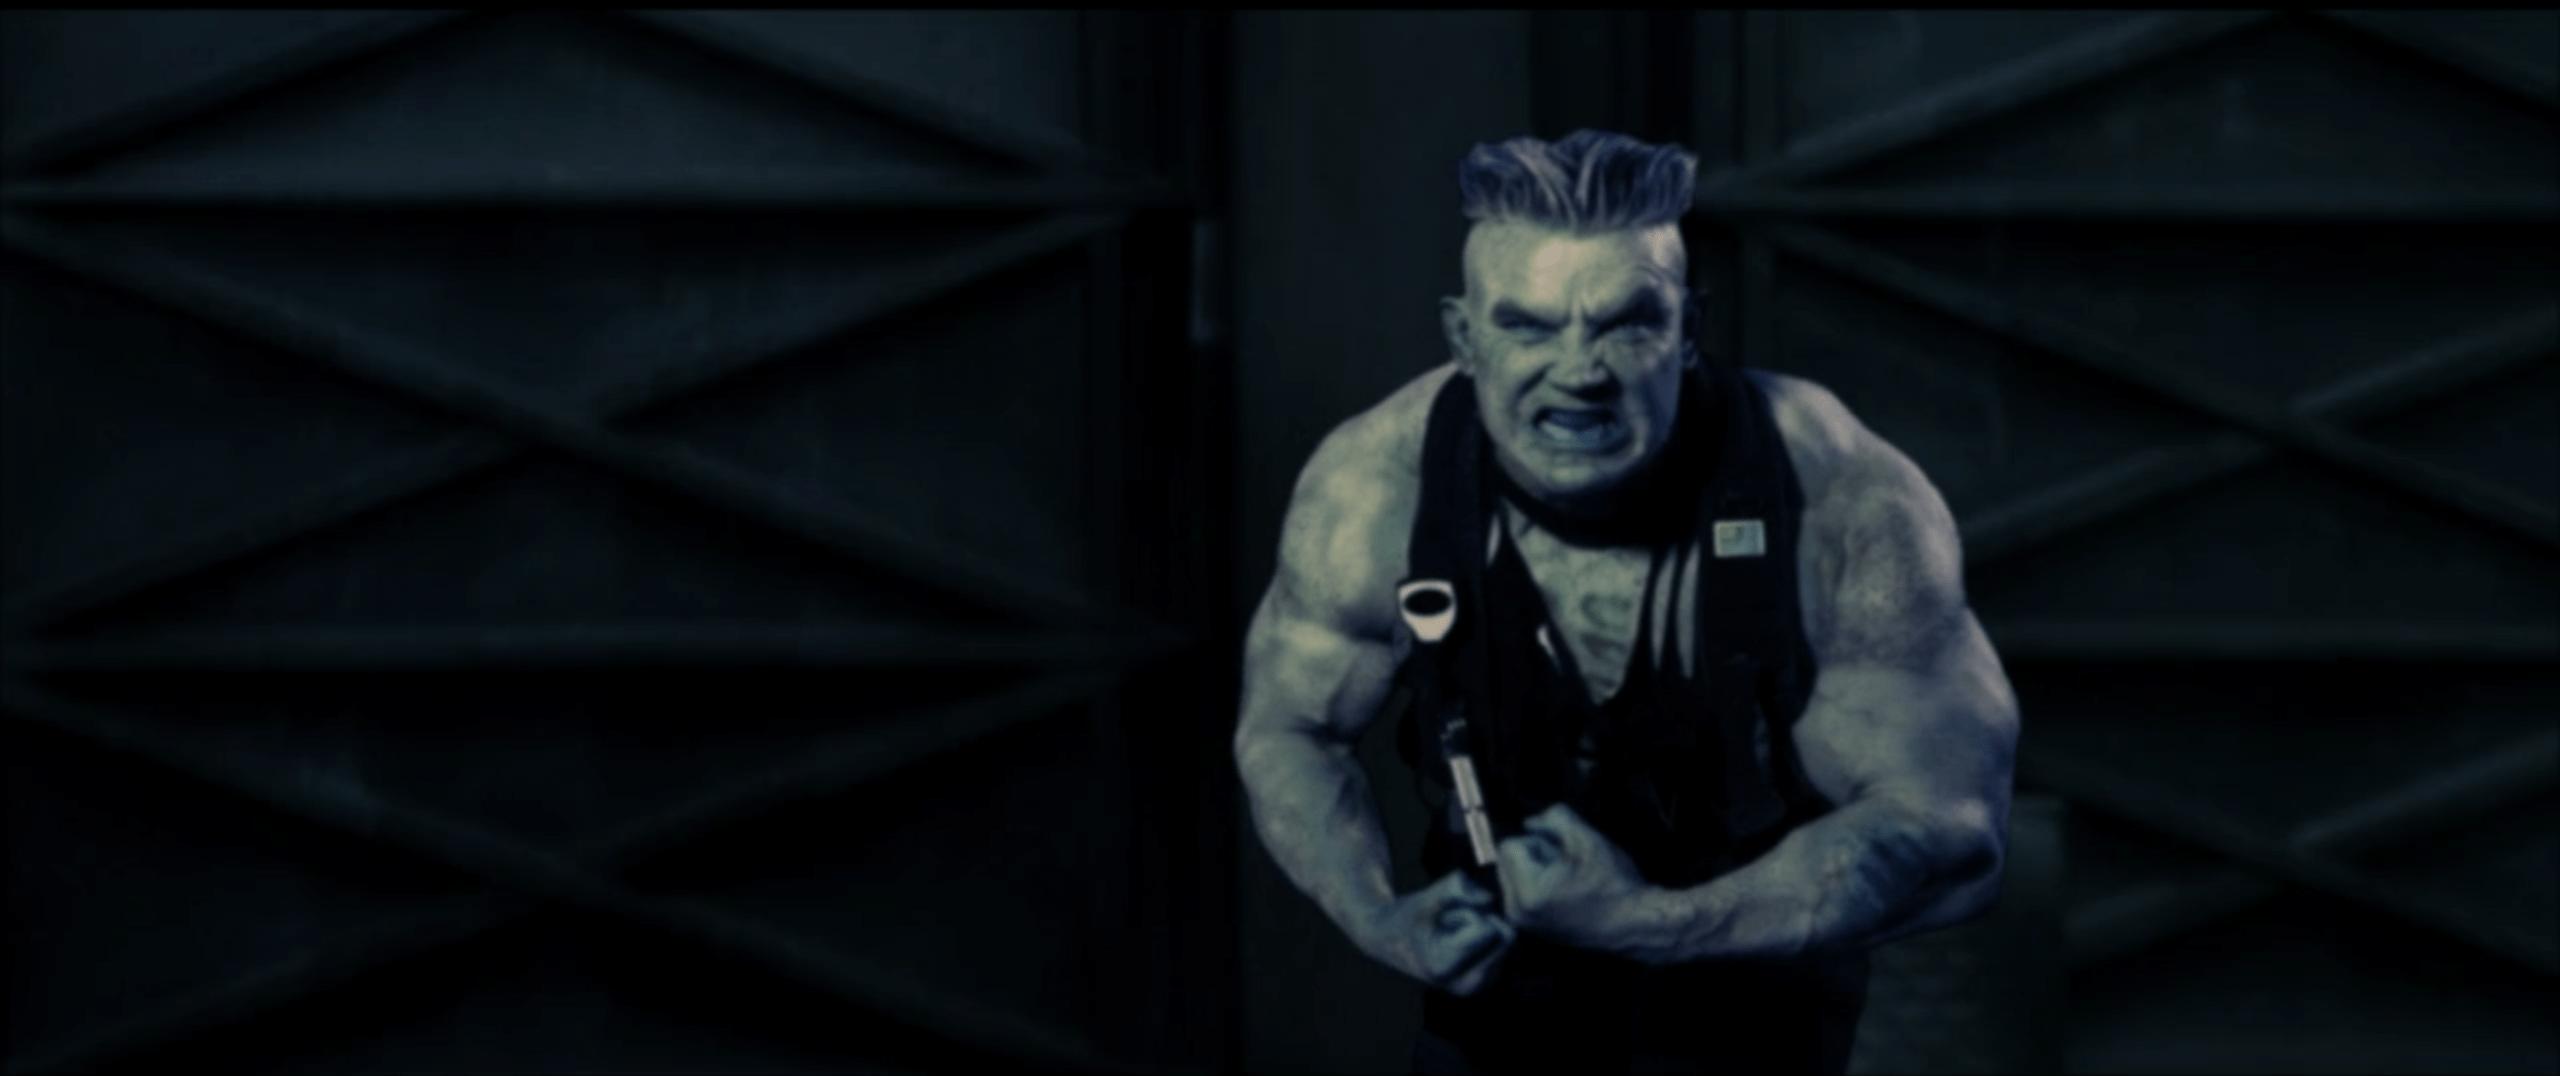 Zombie Duke Nukem flexing his muscles